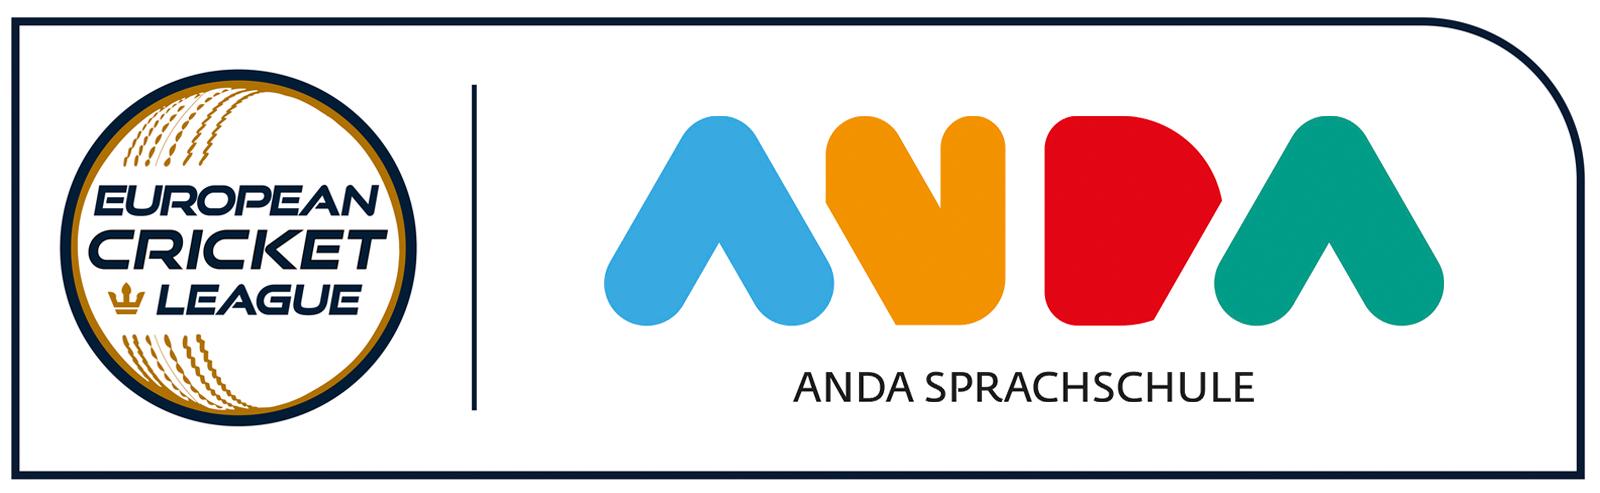 ANDA 1600x900_White copy.png